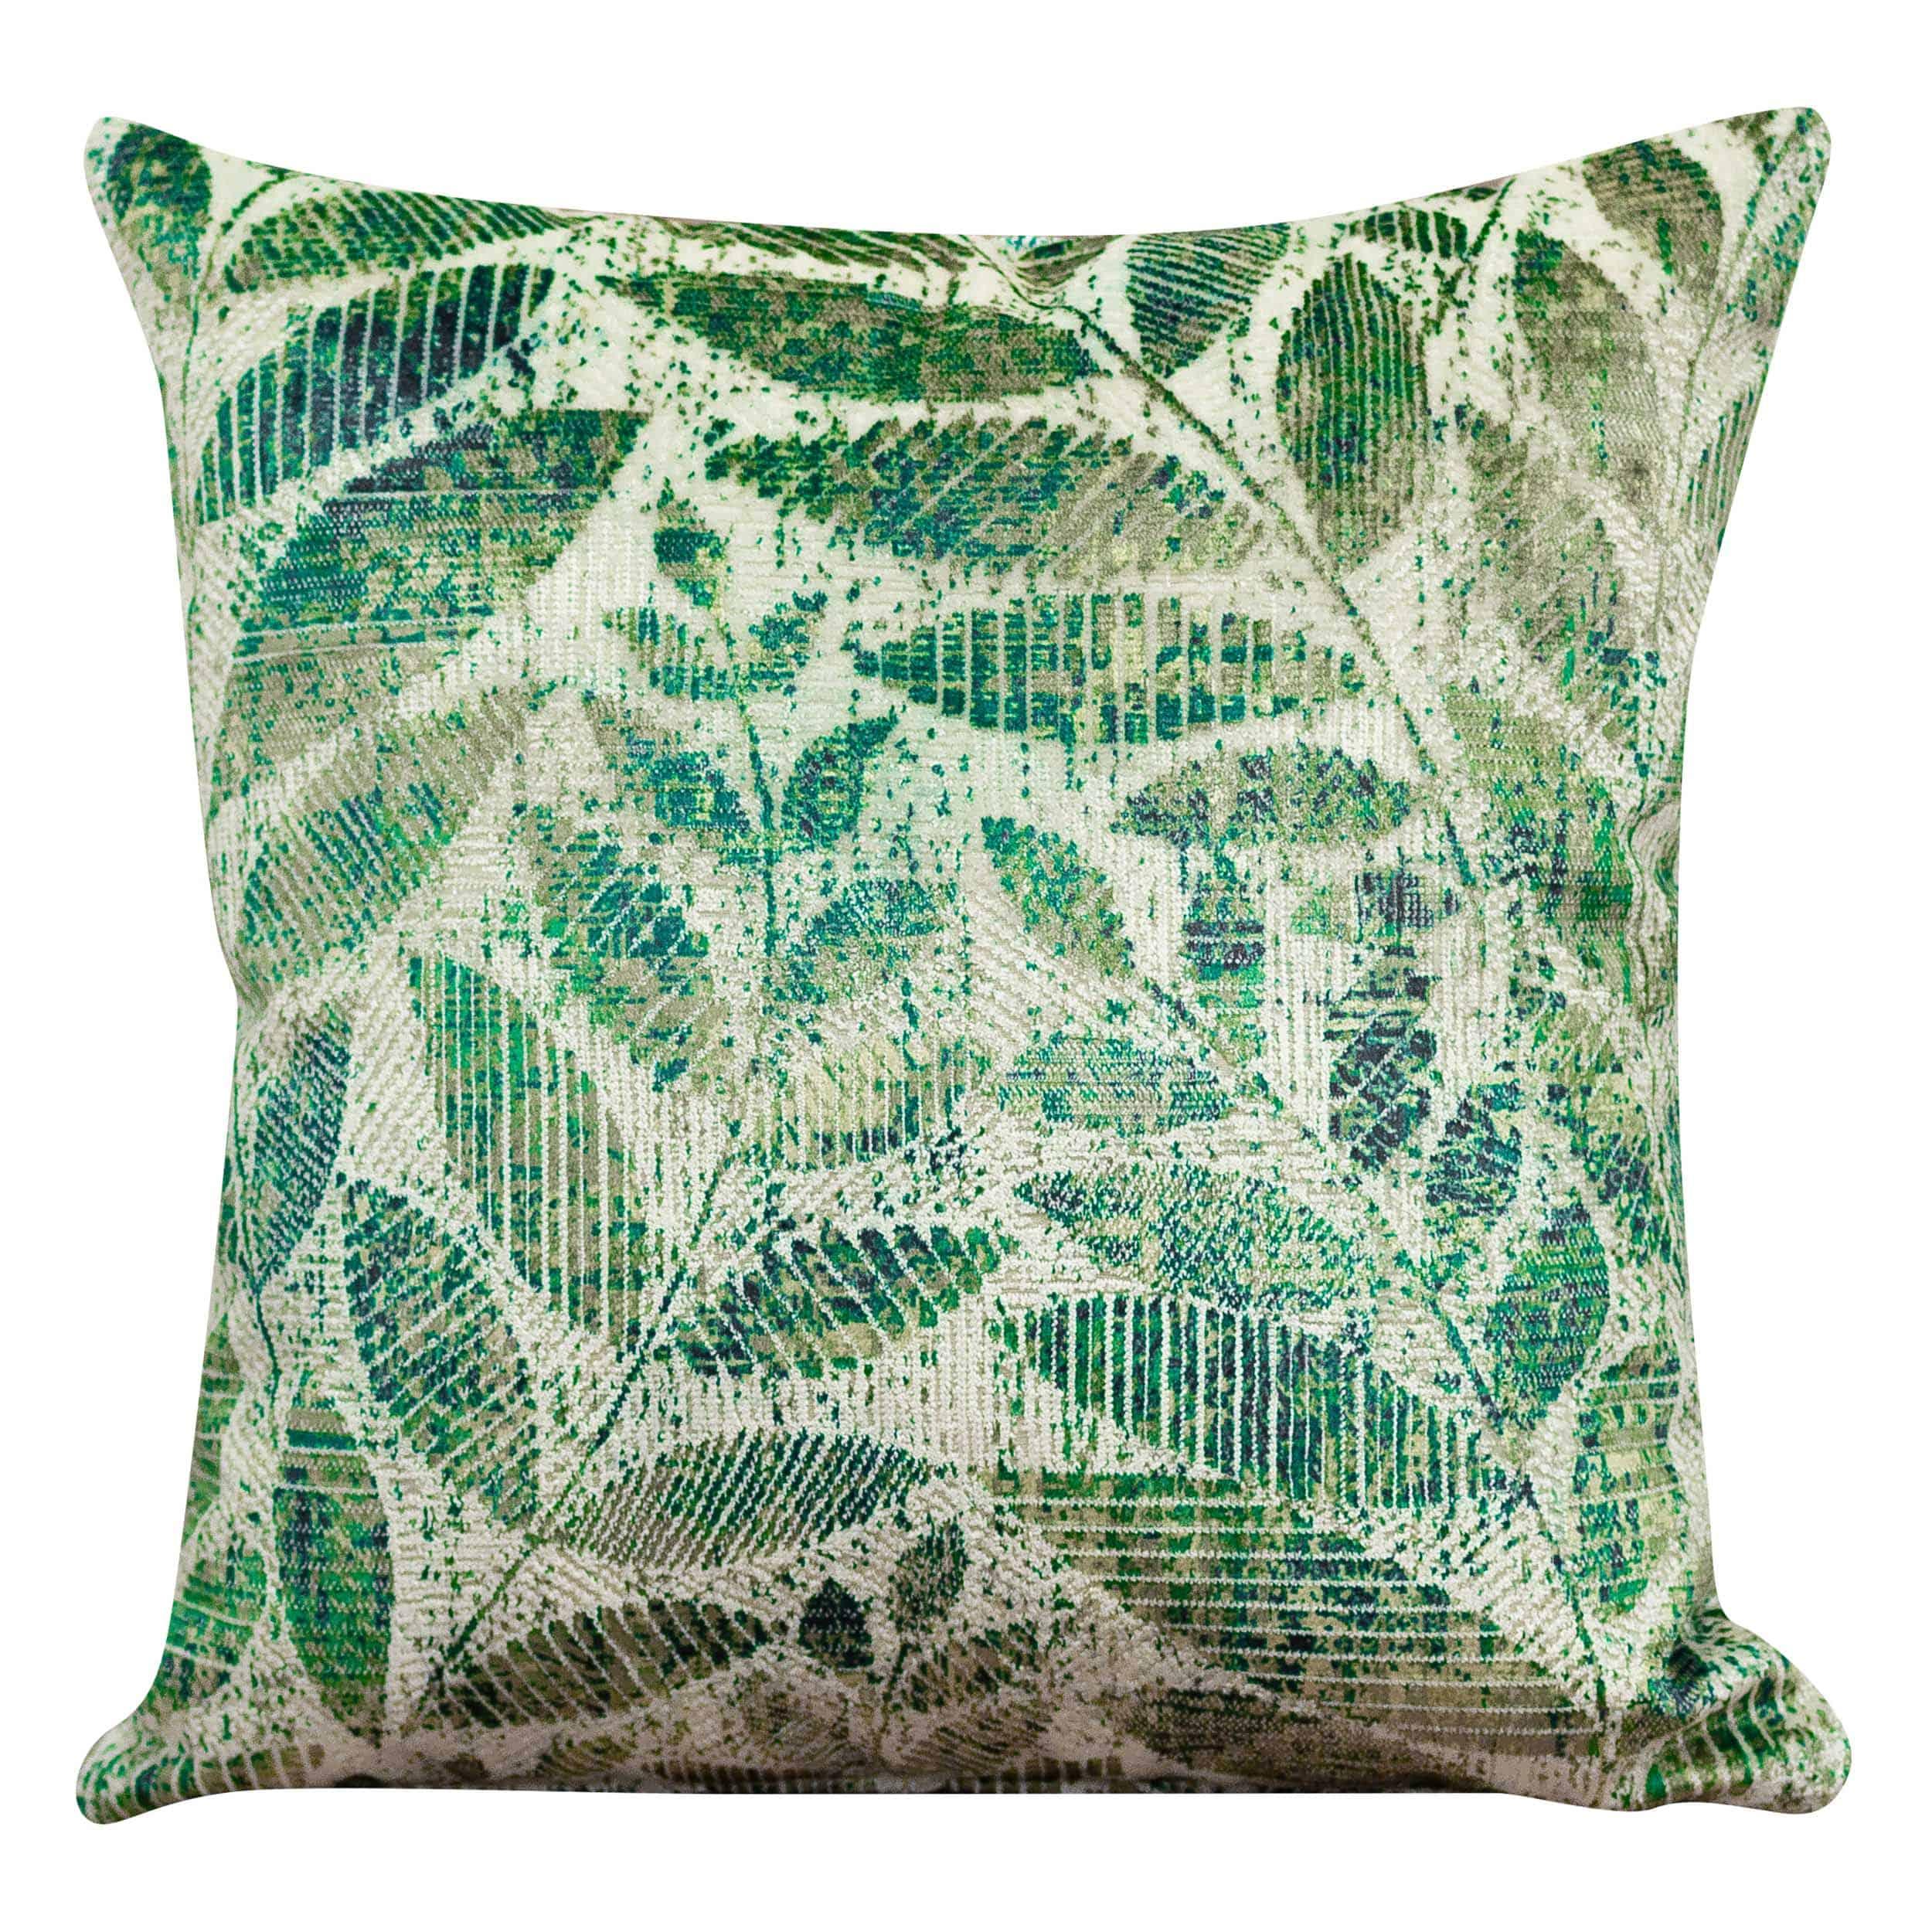 Trailing Leaf Velvet Chenille Cushion in Bright Green